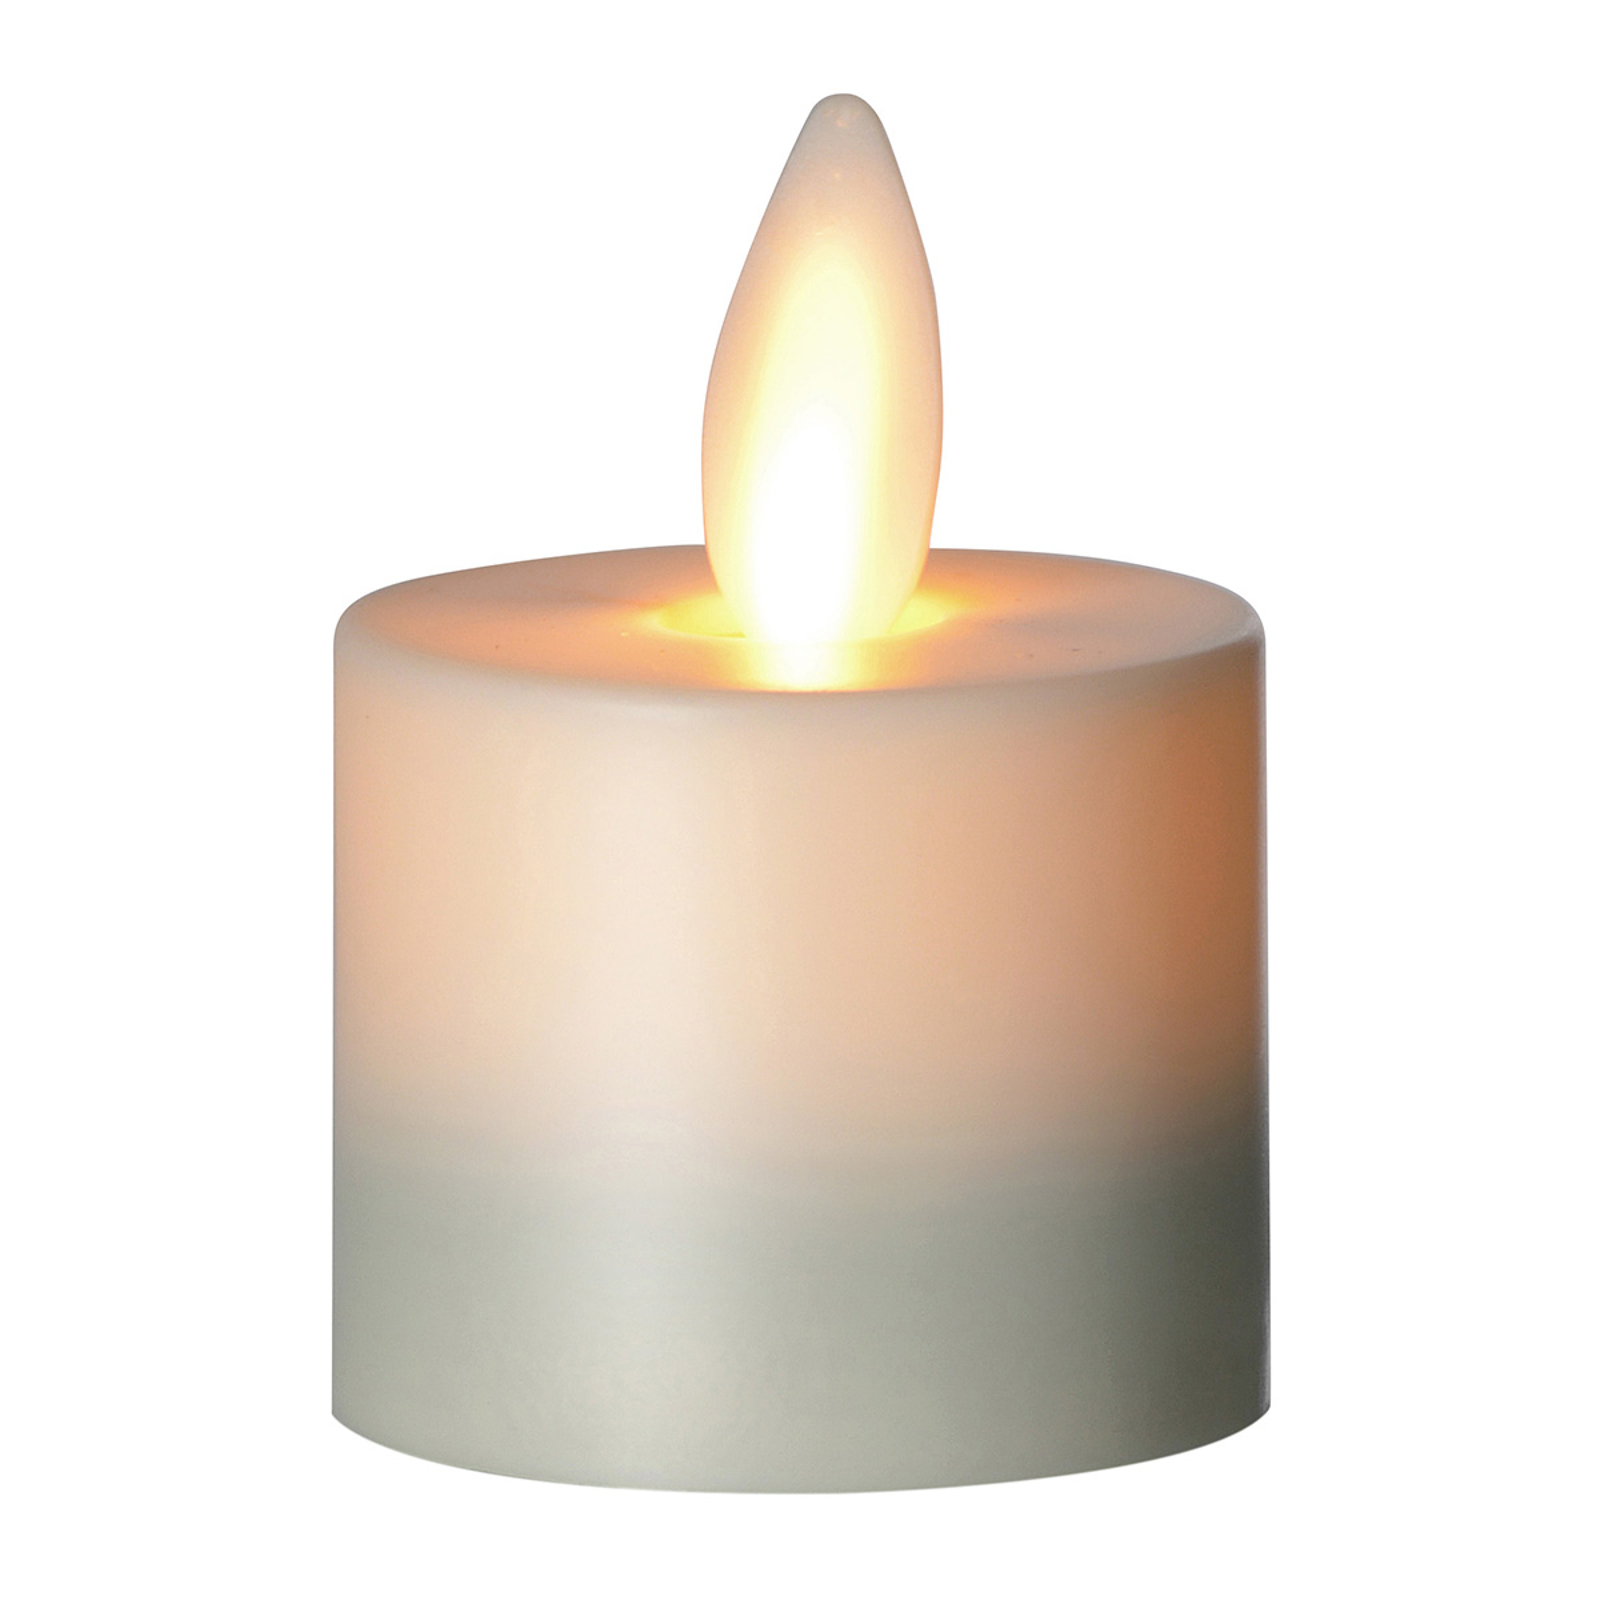 Vela LED Flame vela, 3,1 cm